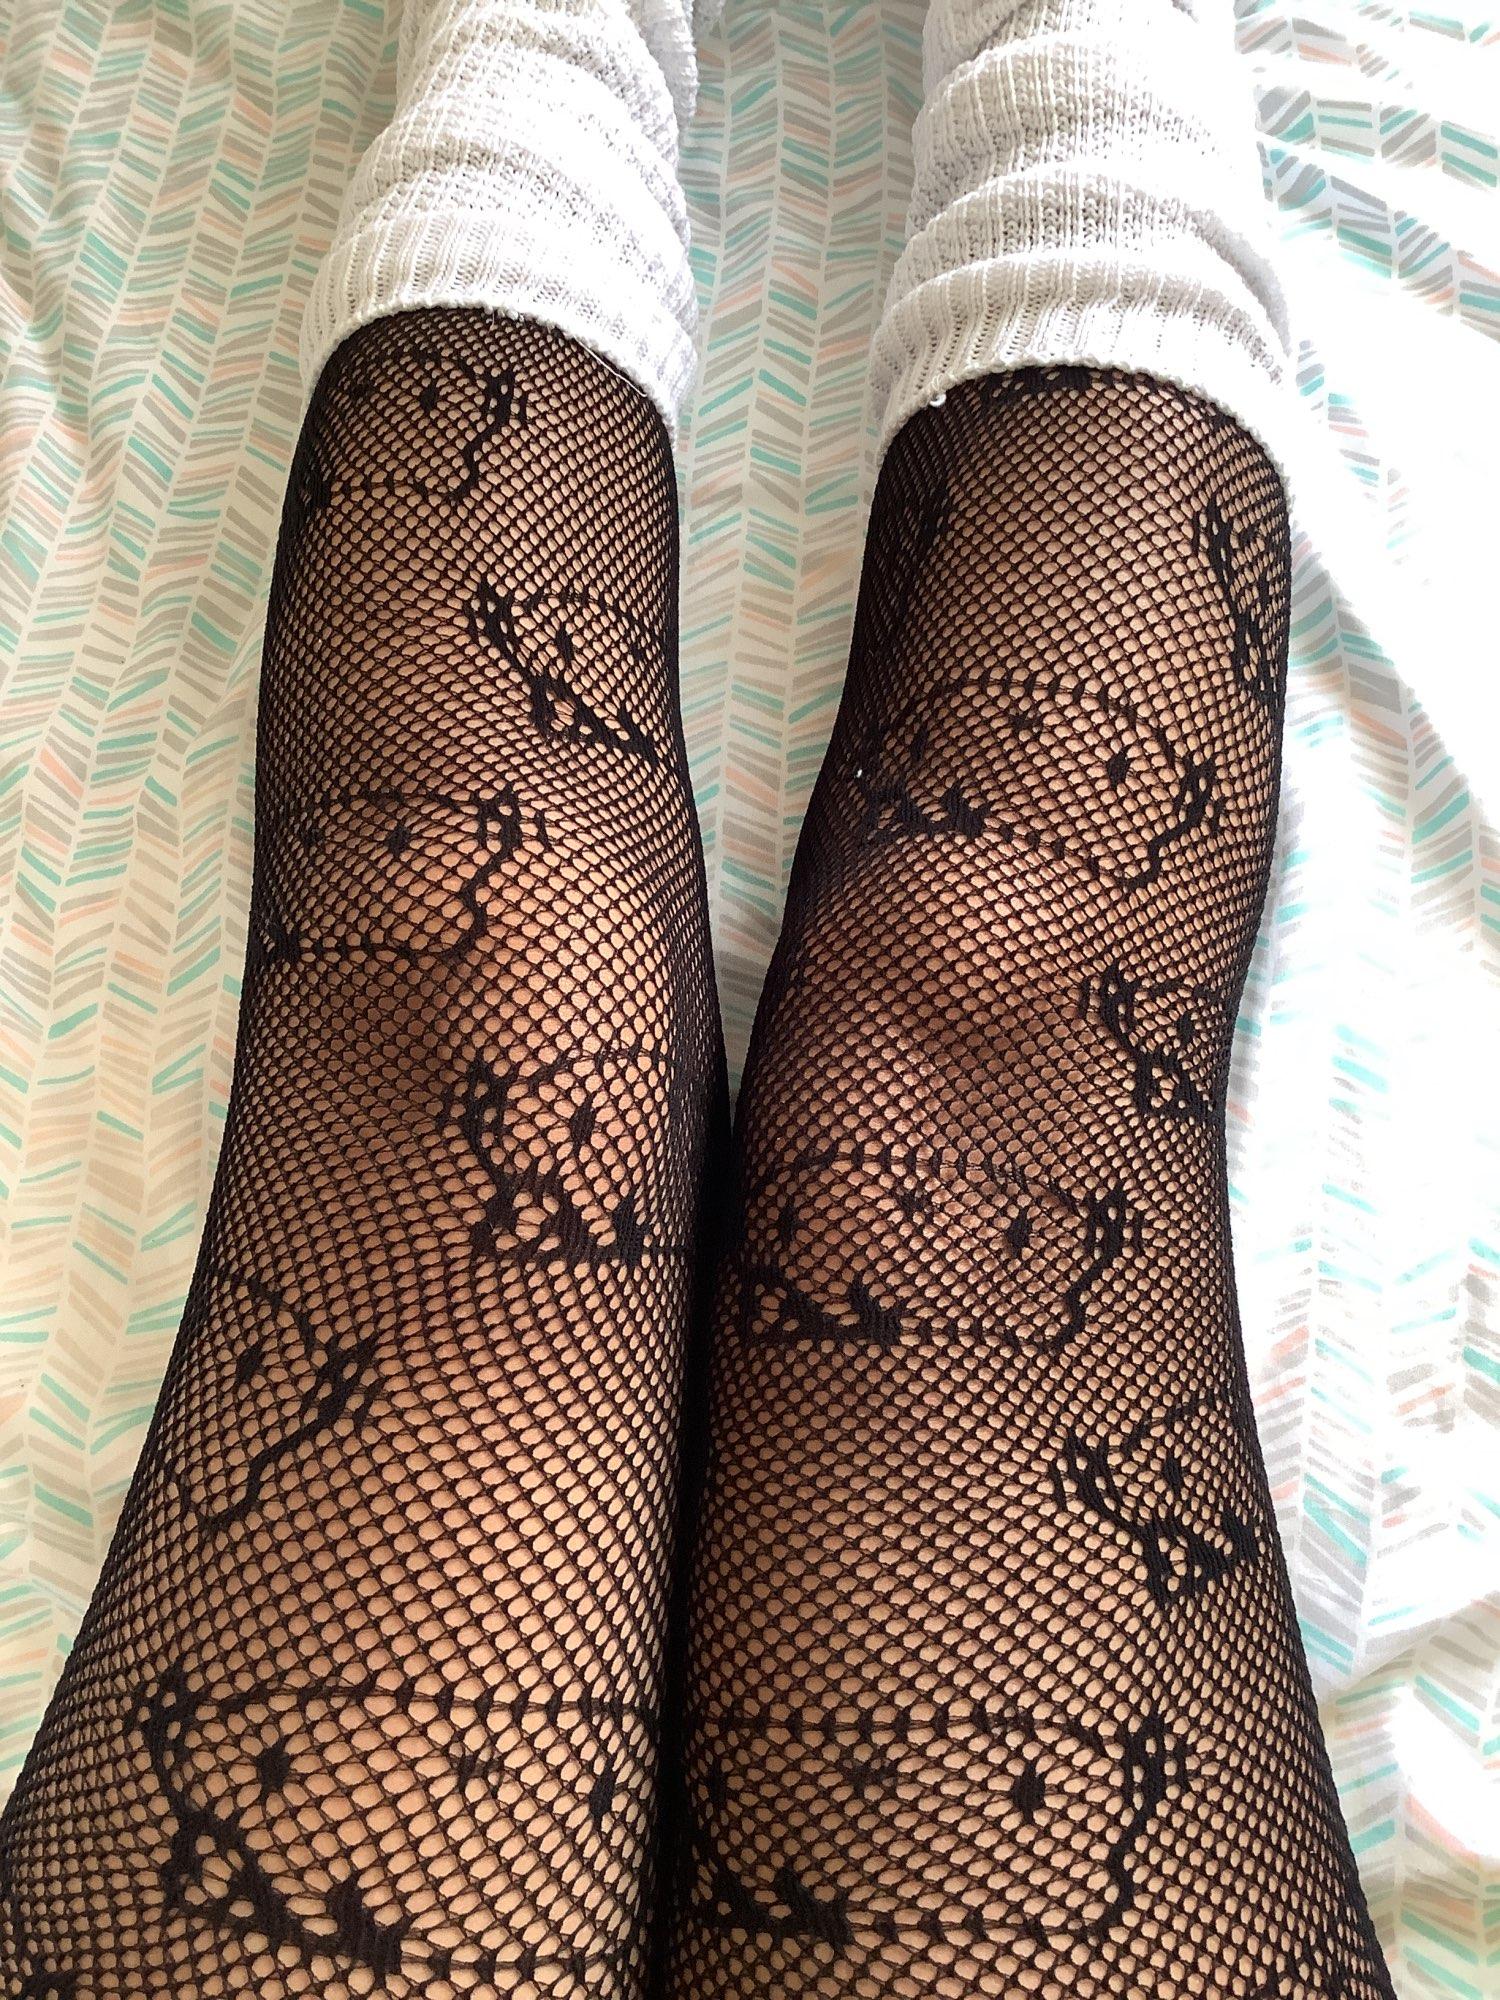 Harajuku Kawaii E-girl Soft Girl Tights with Hello Kitty Pattern photo review